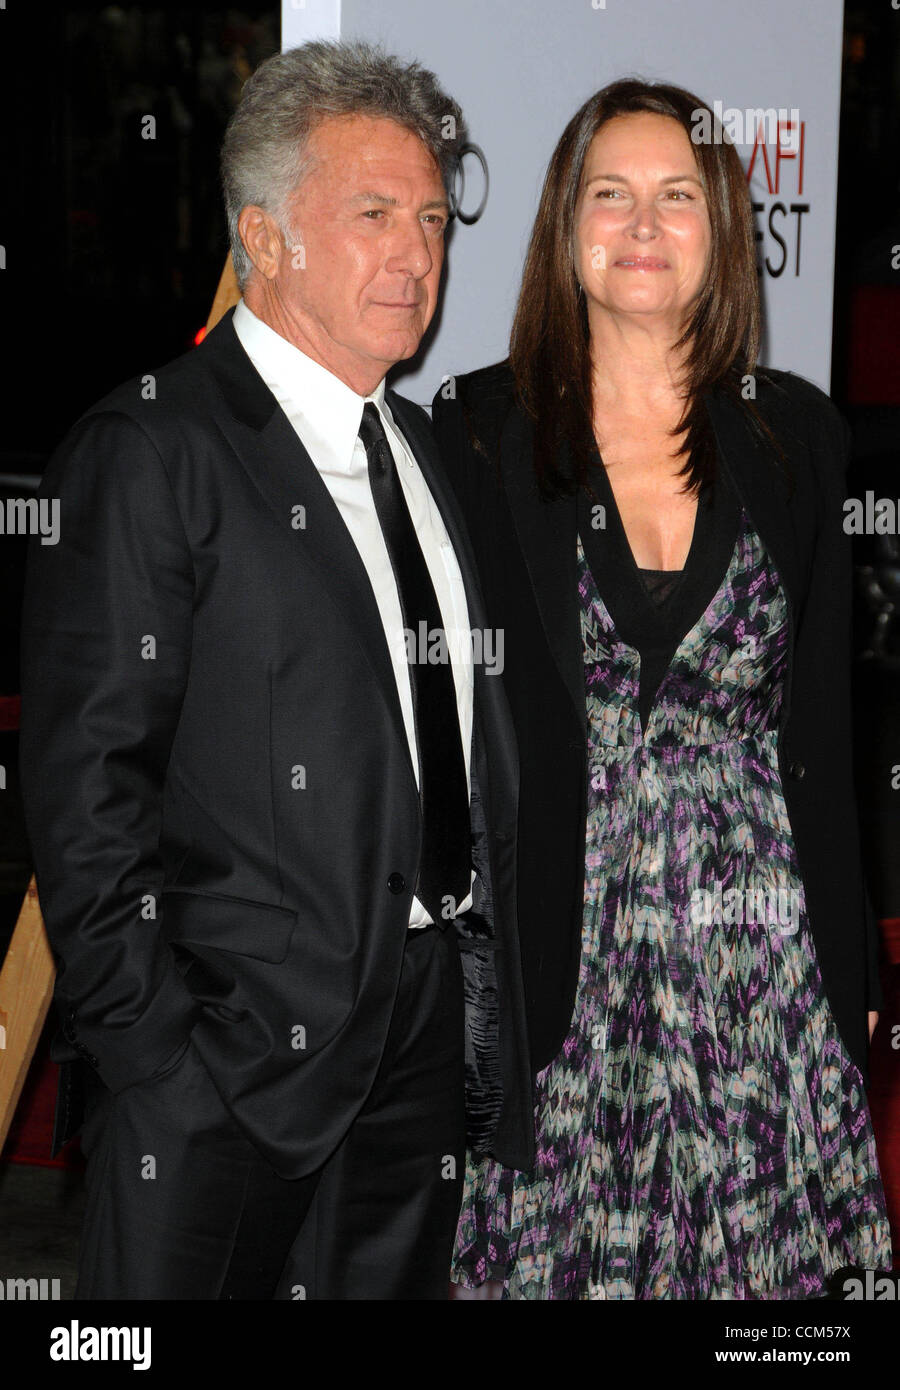 Nov. 6, 2010 - Los Angeles, California, U.S. - Dustin Hoffman Attending The AFI Fest Centerpiece Gala Screening - Stock Image